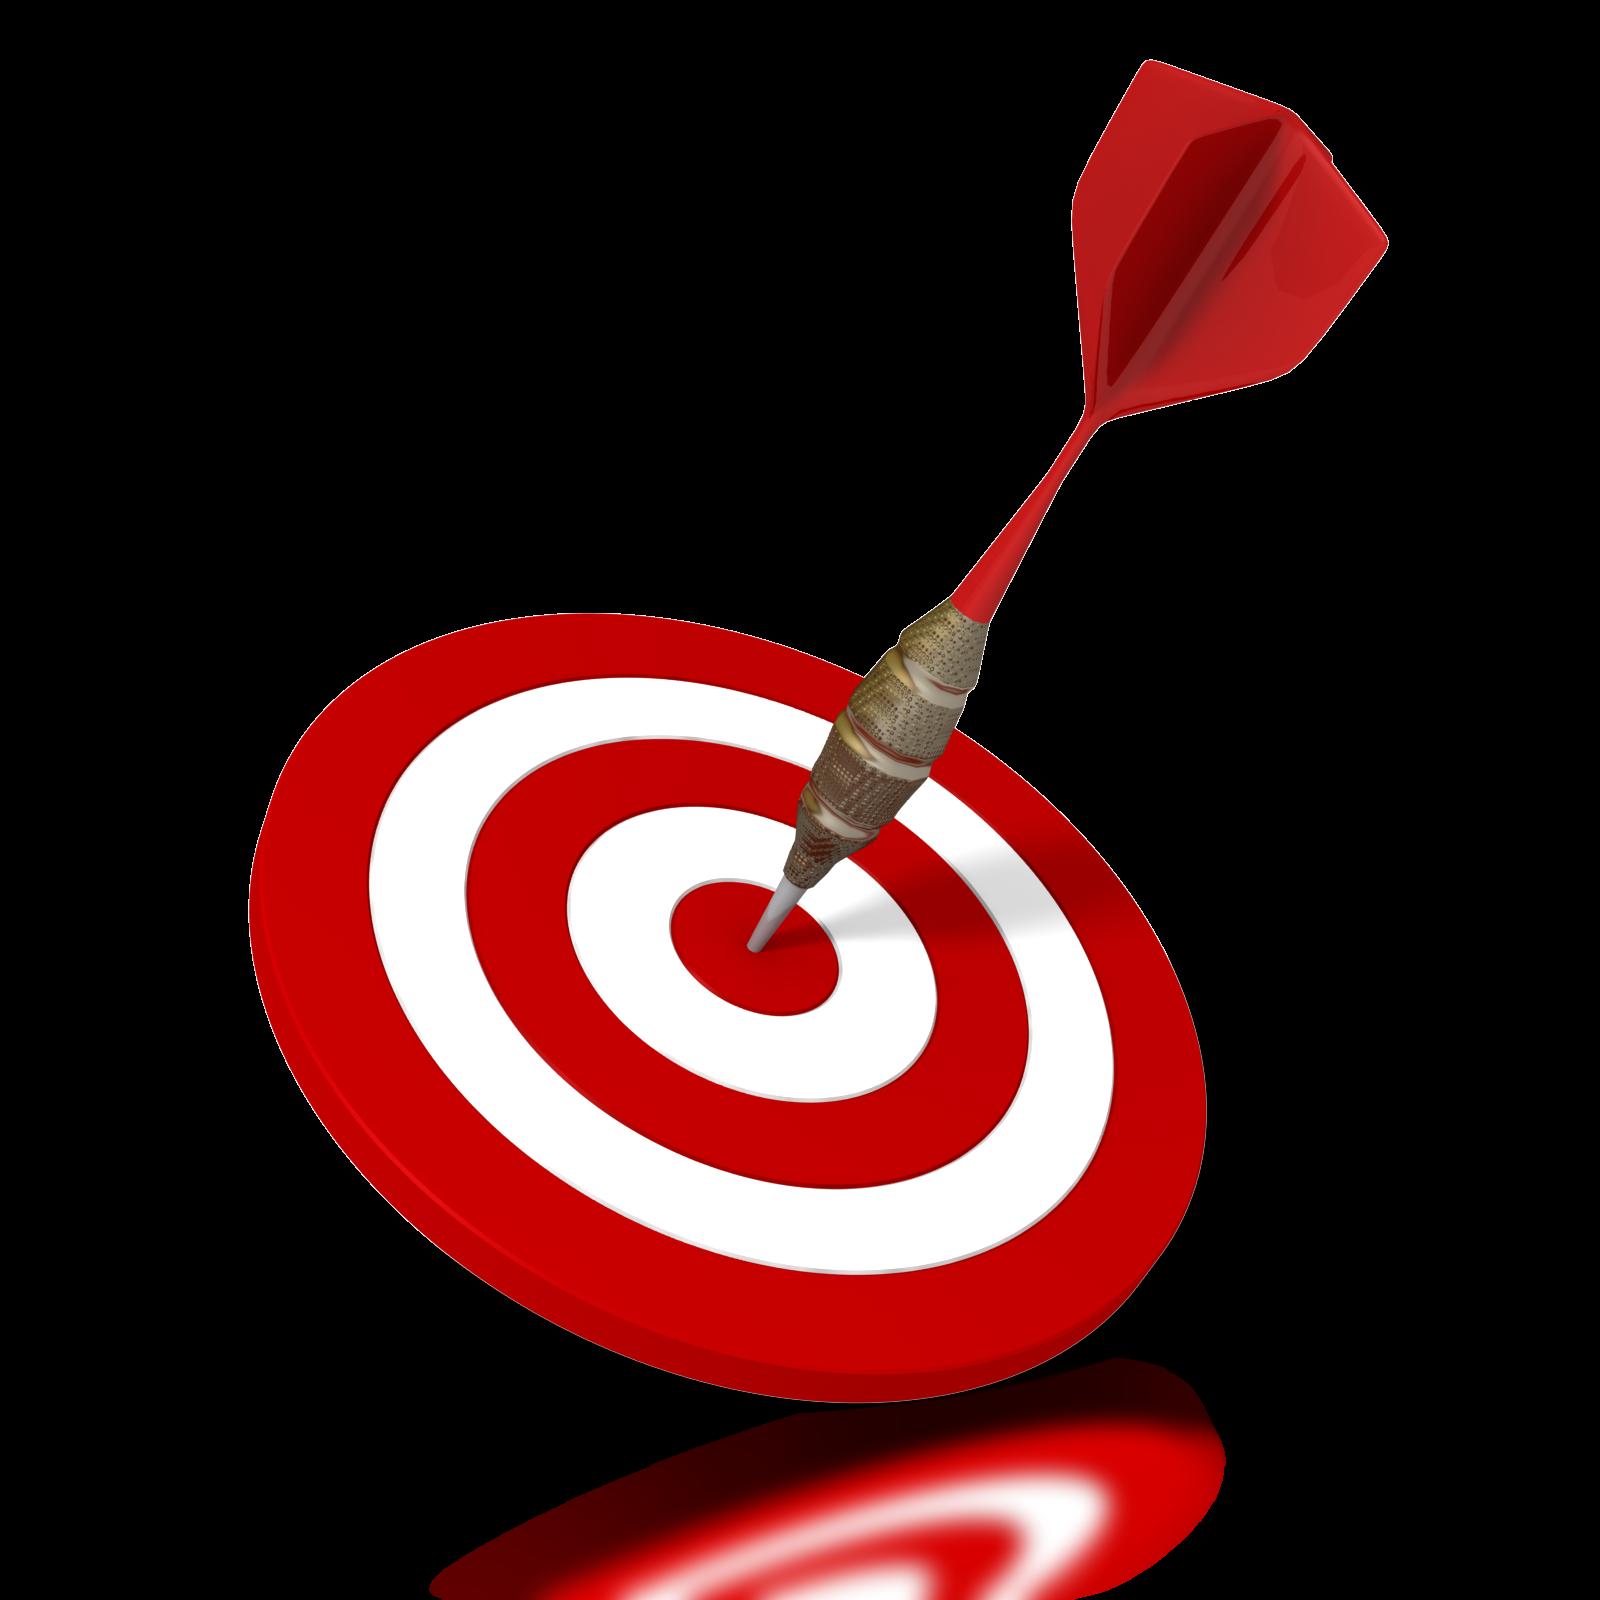 download target png images hq png image freepngimg free clip art fishing free clip art fishing boat